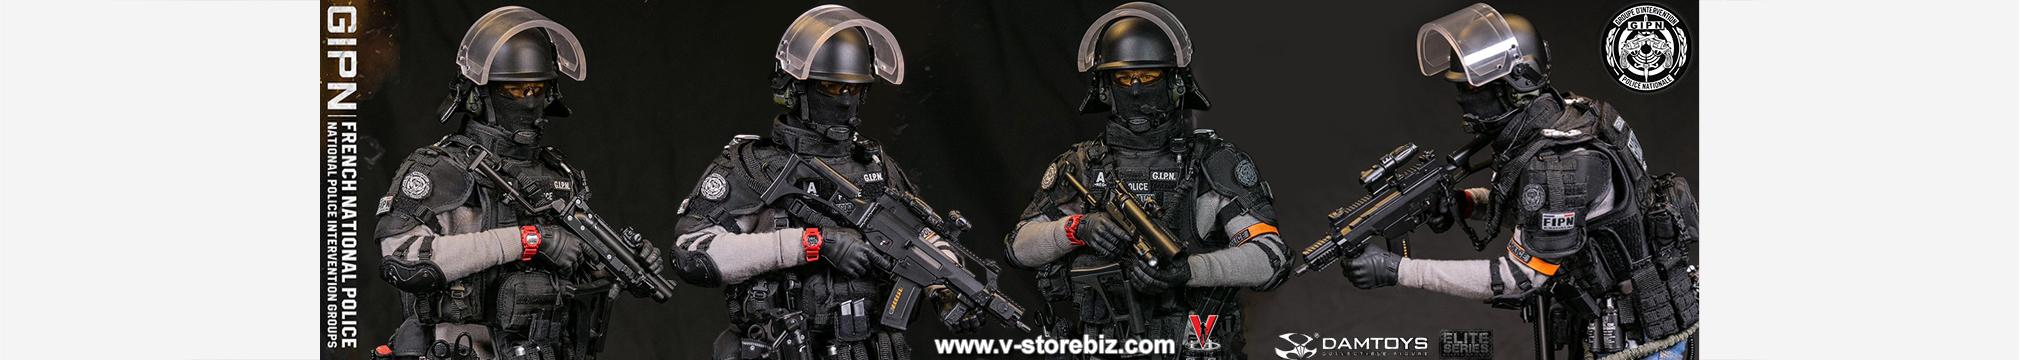 1//6 scale toy Sniper Elite Black Pistol /& Accessory Set Multicam